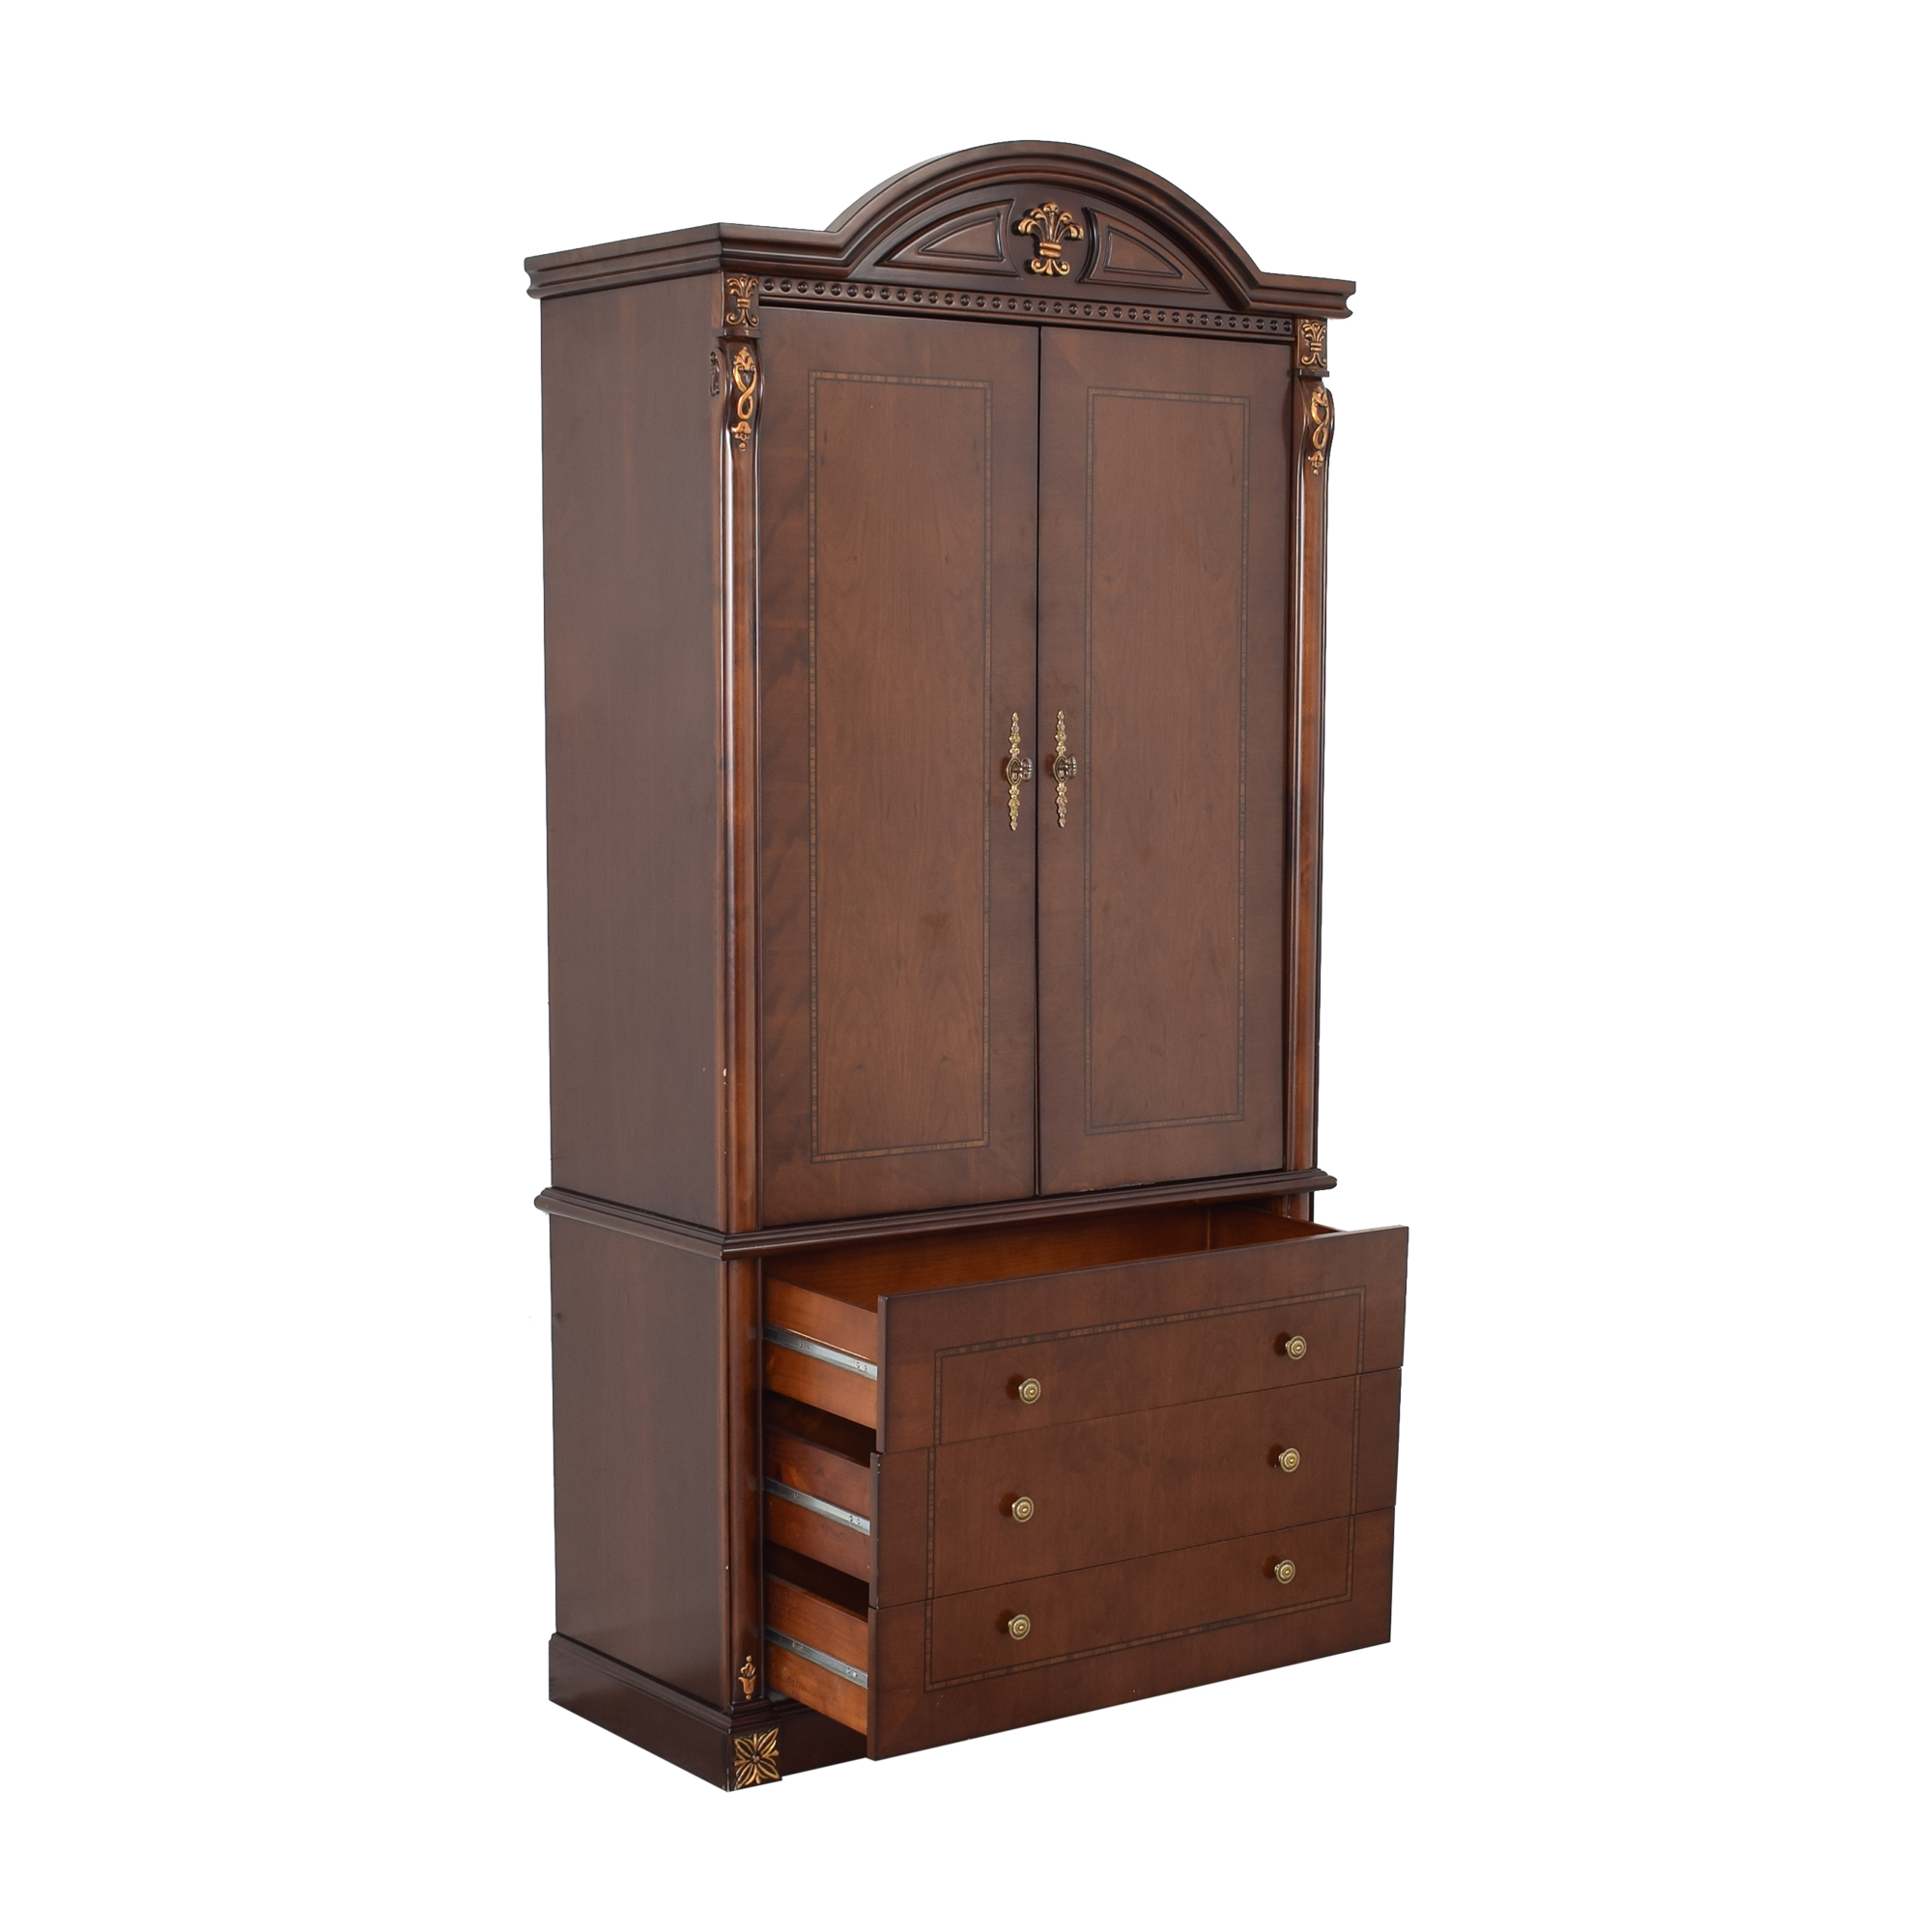 Chippendale Style Wardrobe Storage